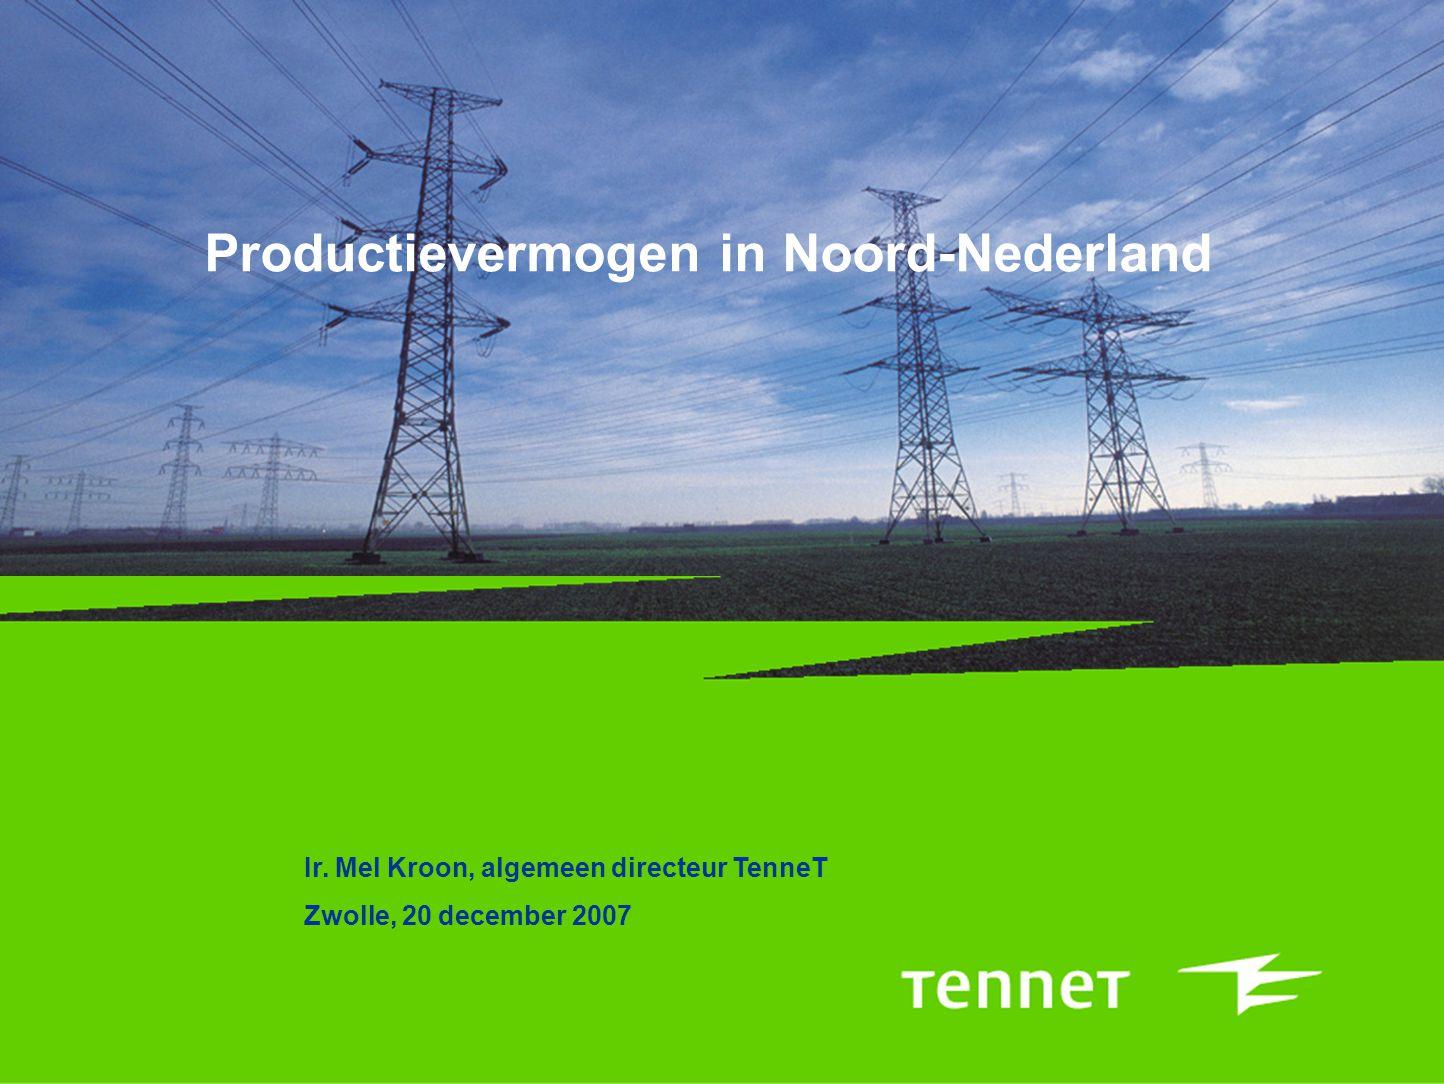 Productievermogen in Noord-Nederland